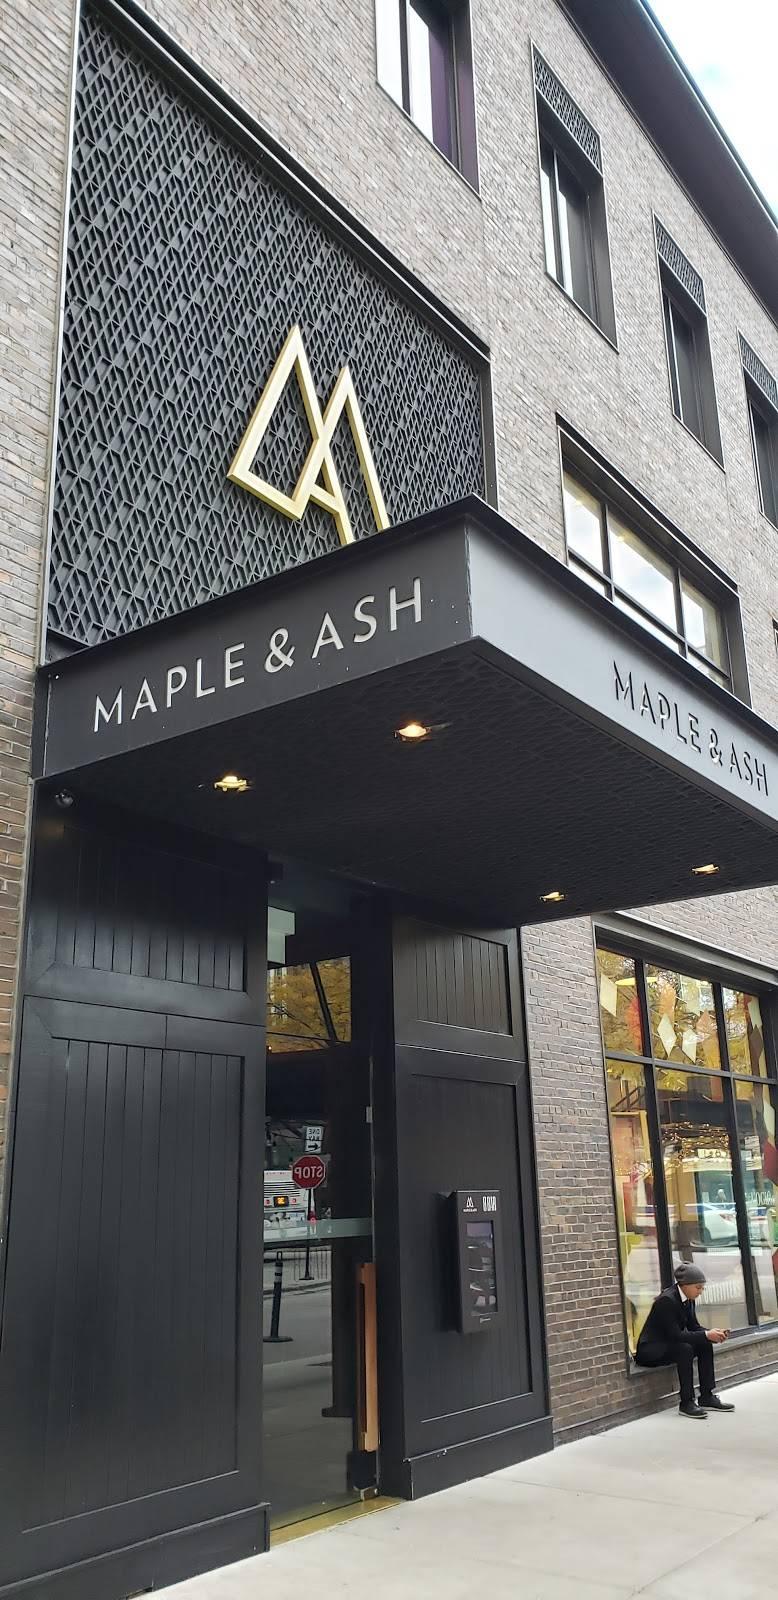 Maple & Ash | night club | 8 W Maple St, Chicago, IL 60610, USA | 3129448888 OR +1 312-944-8888